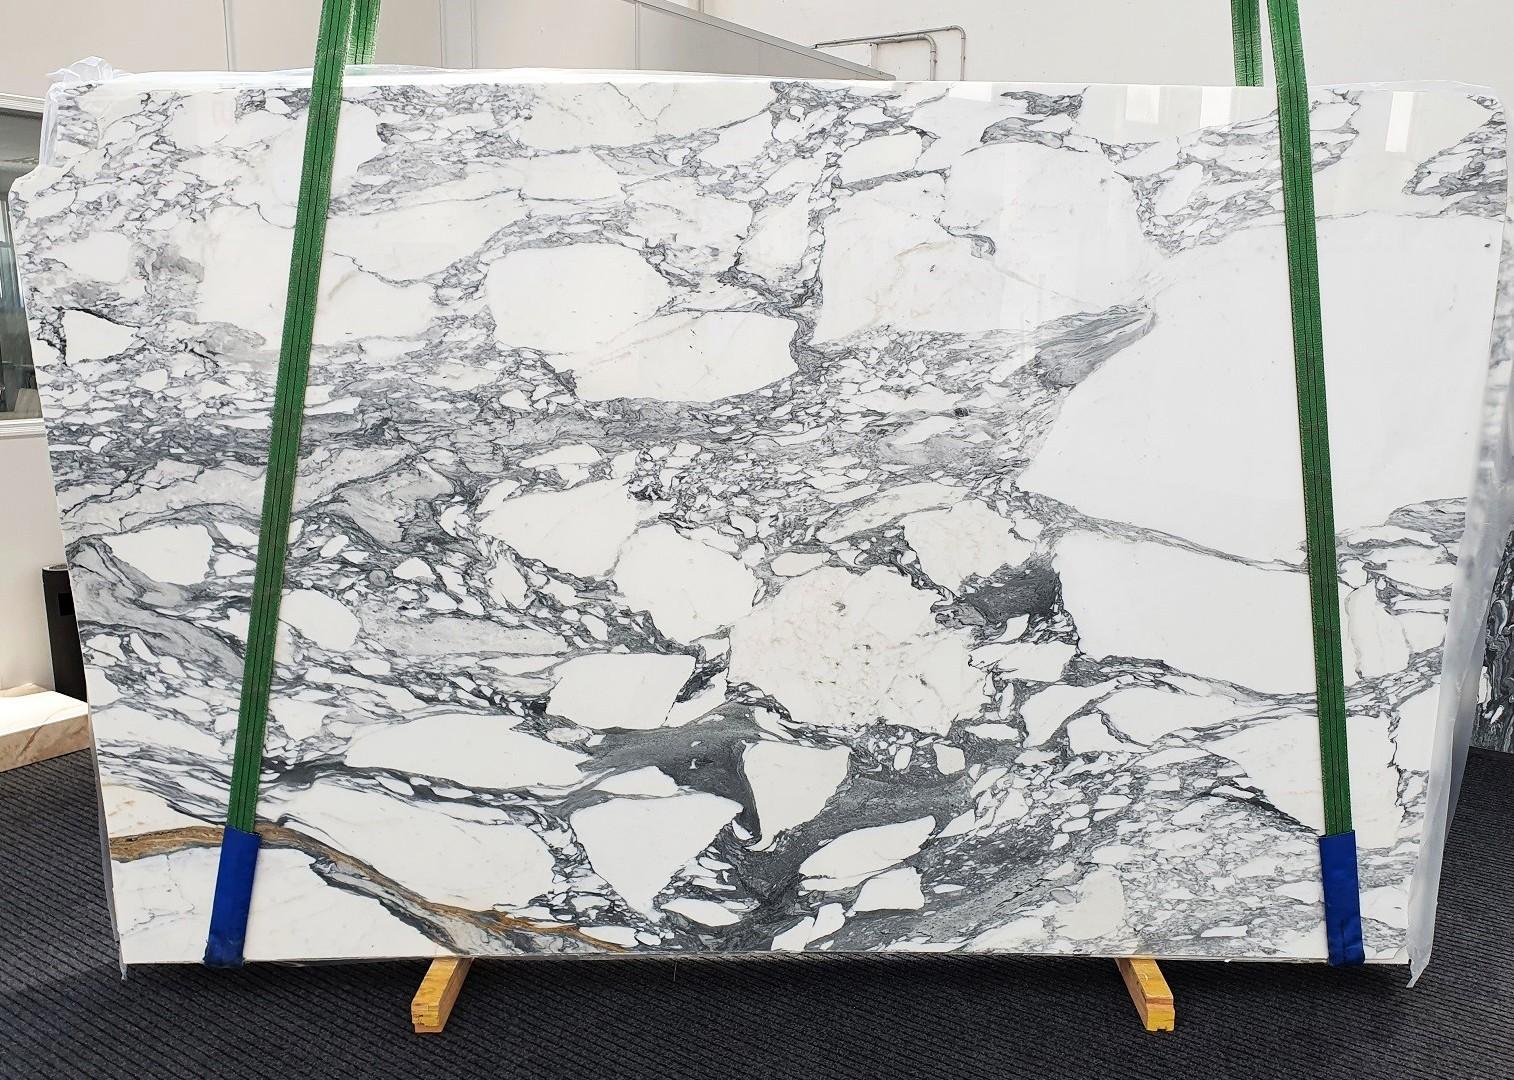 ARABESCATO CORCHIA polierte Unmaßplatten 1433 aus Natur Marmor , Slab #09: Lieferung Veneto, Italien